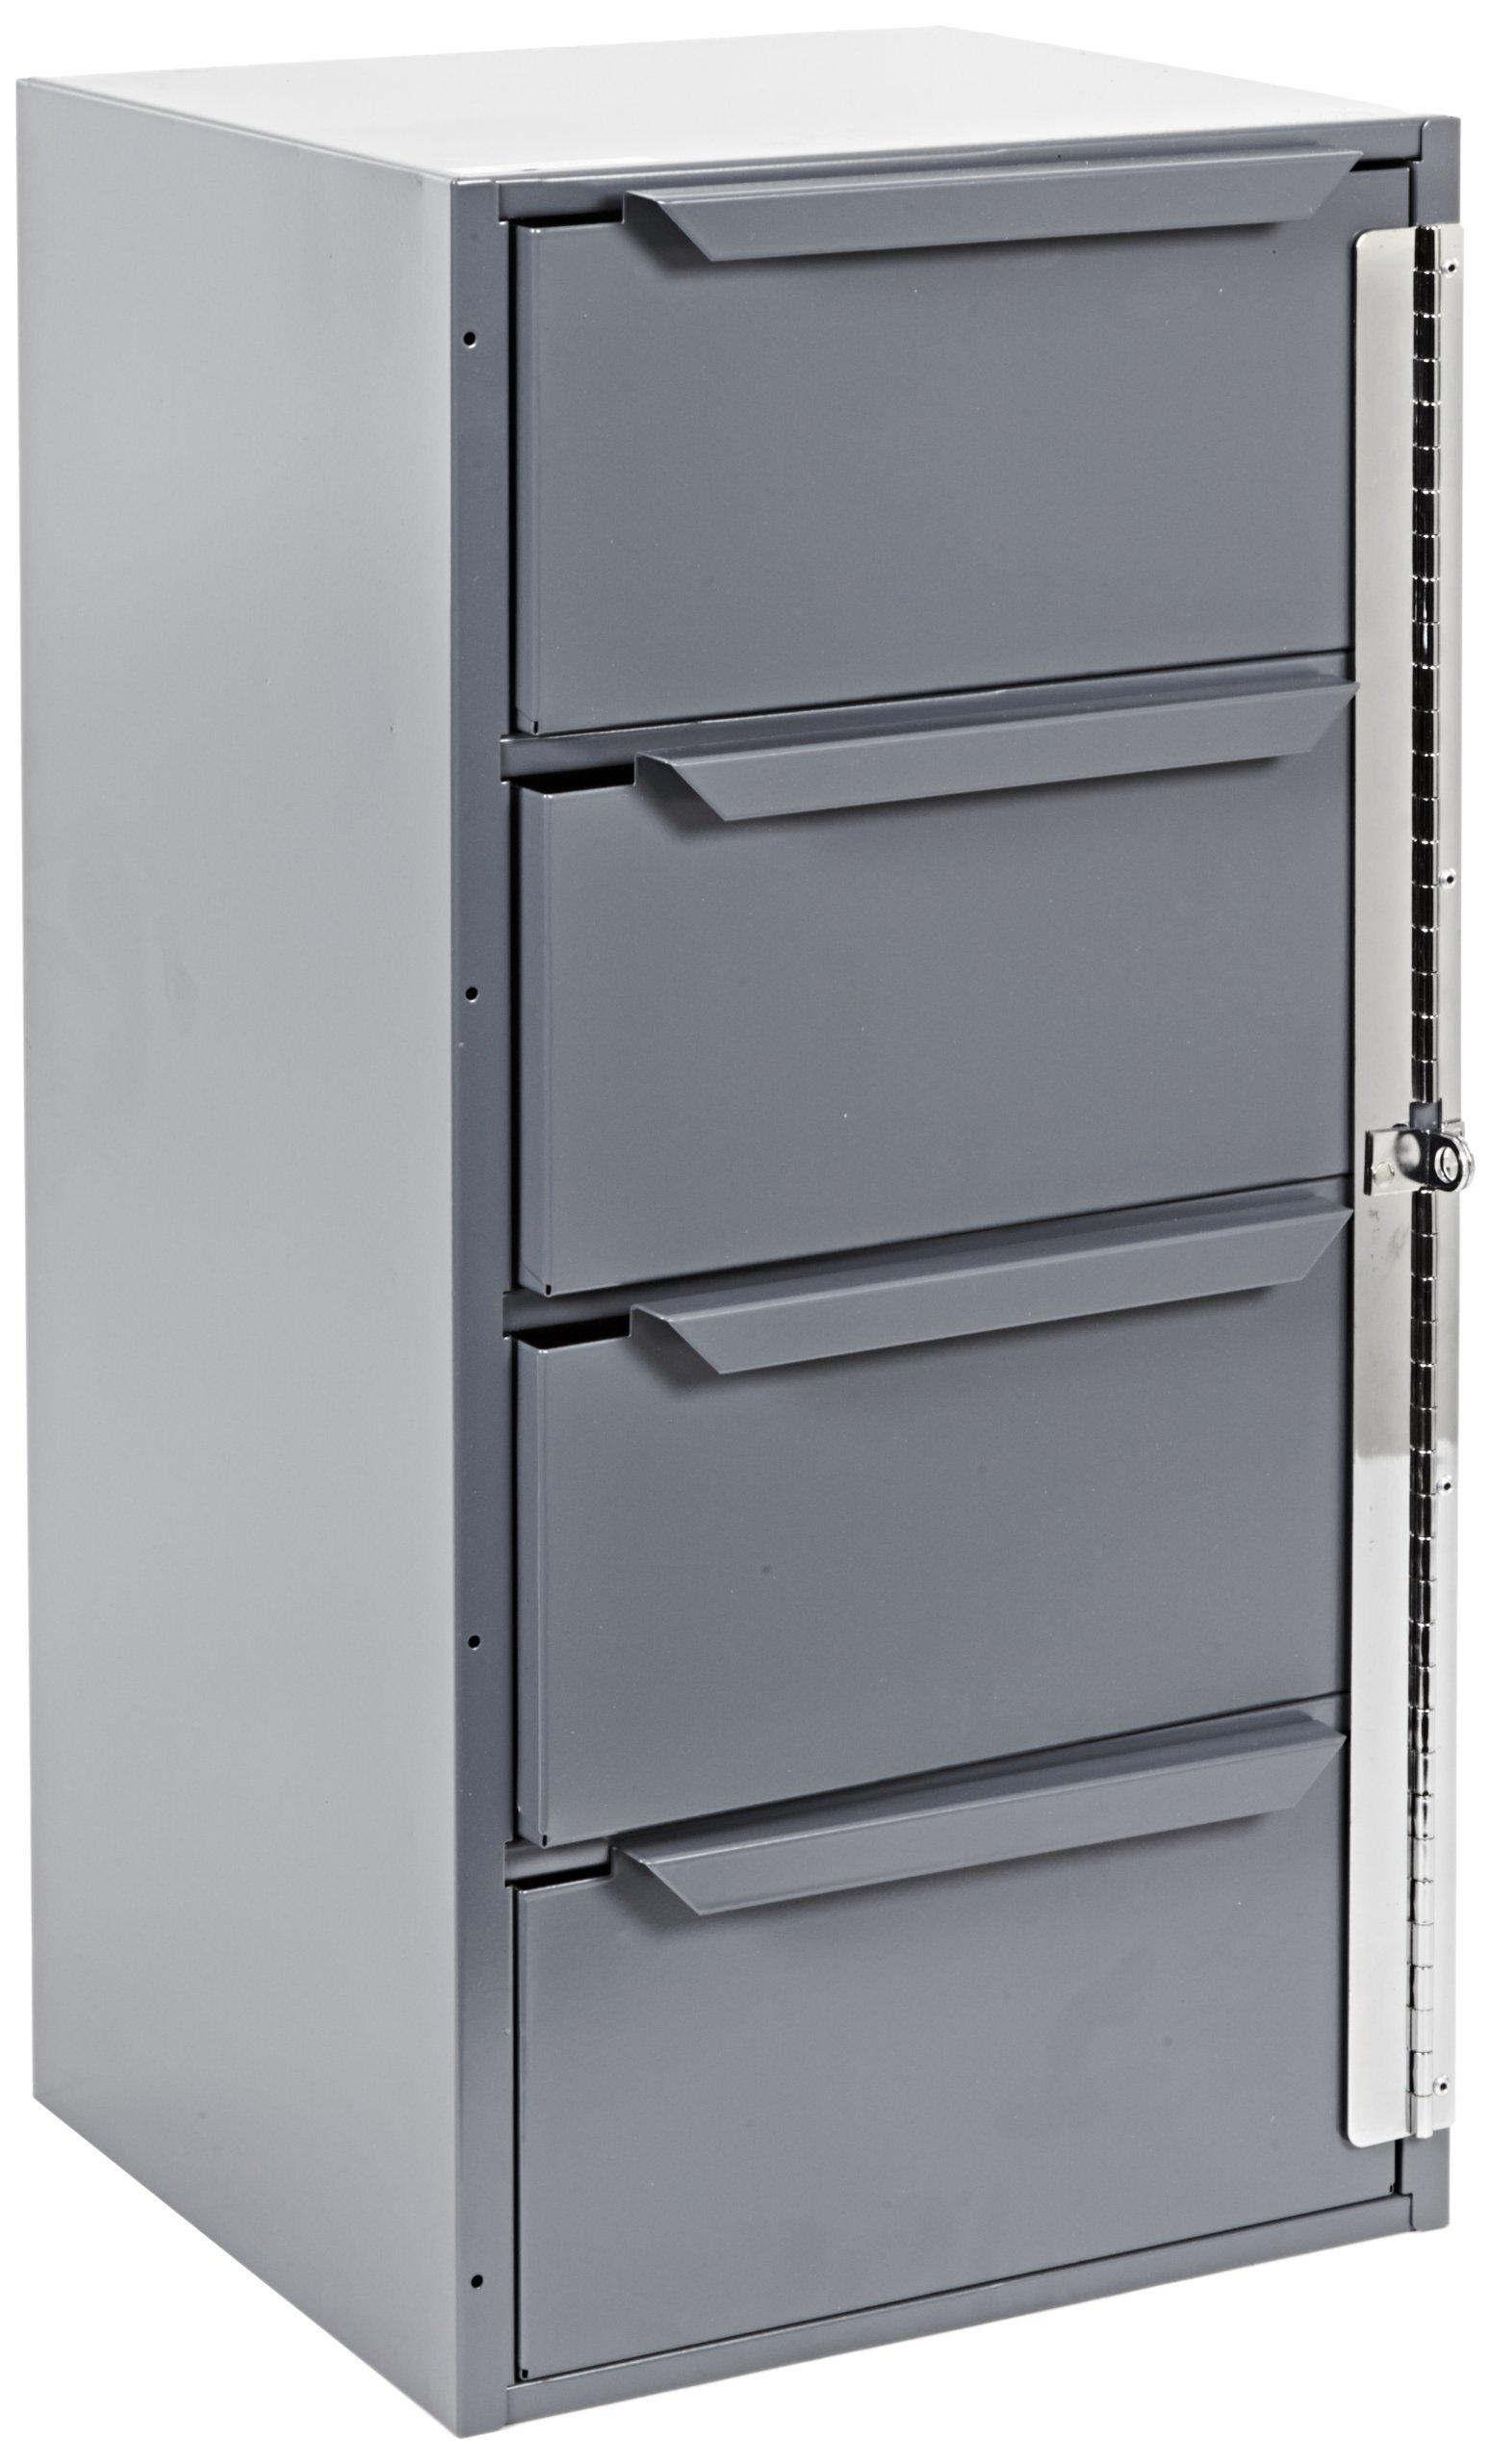 "Durham 610-95 Gray Welded Steel Cabinet, 12-5/8"" Width x 24-1/2"" Height x 12-1/8"" Depth, 4 Drawers"